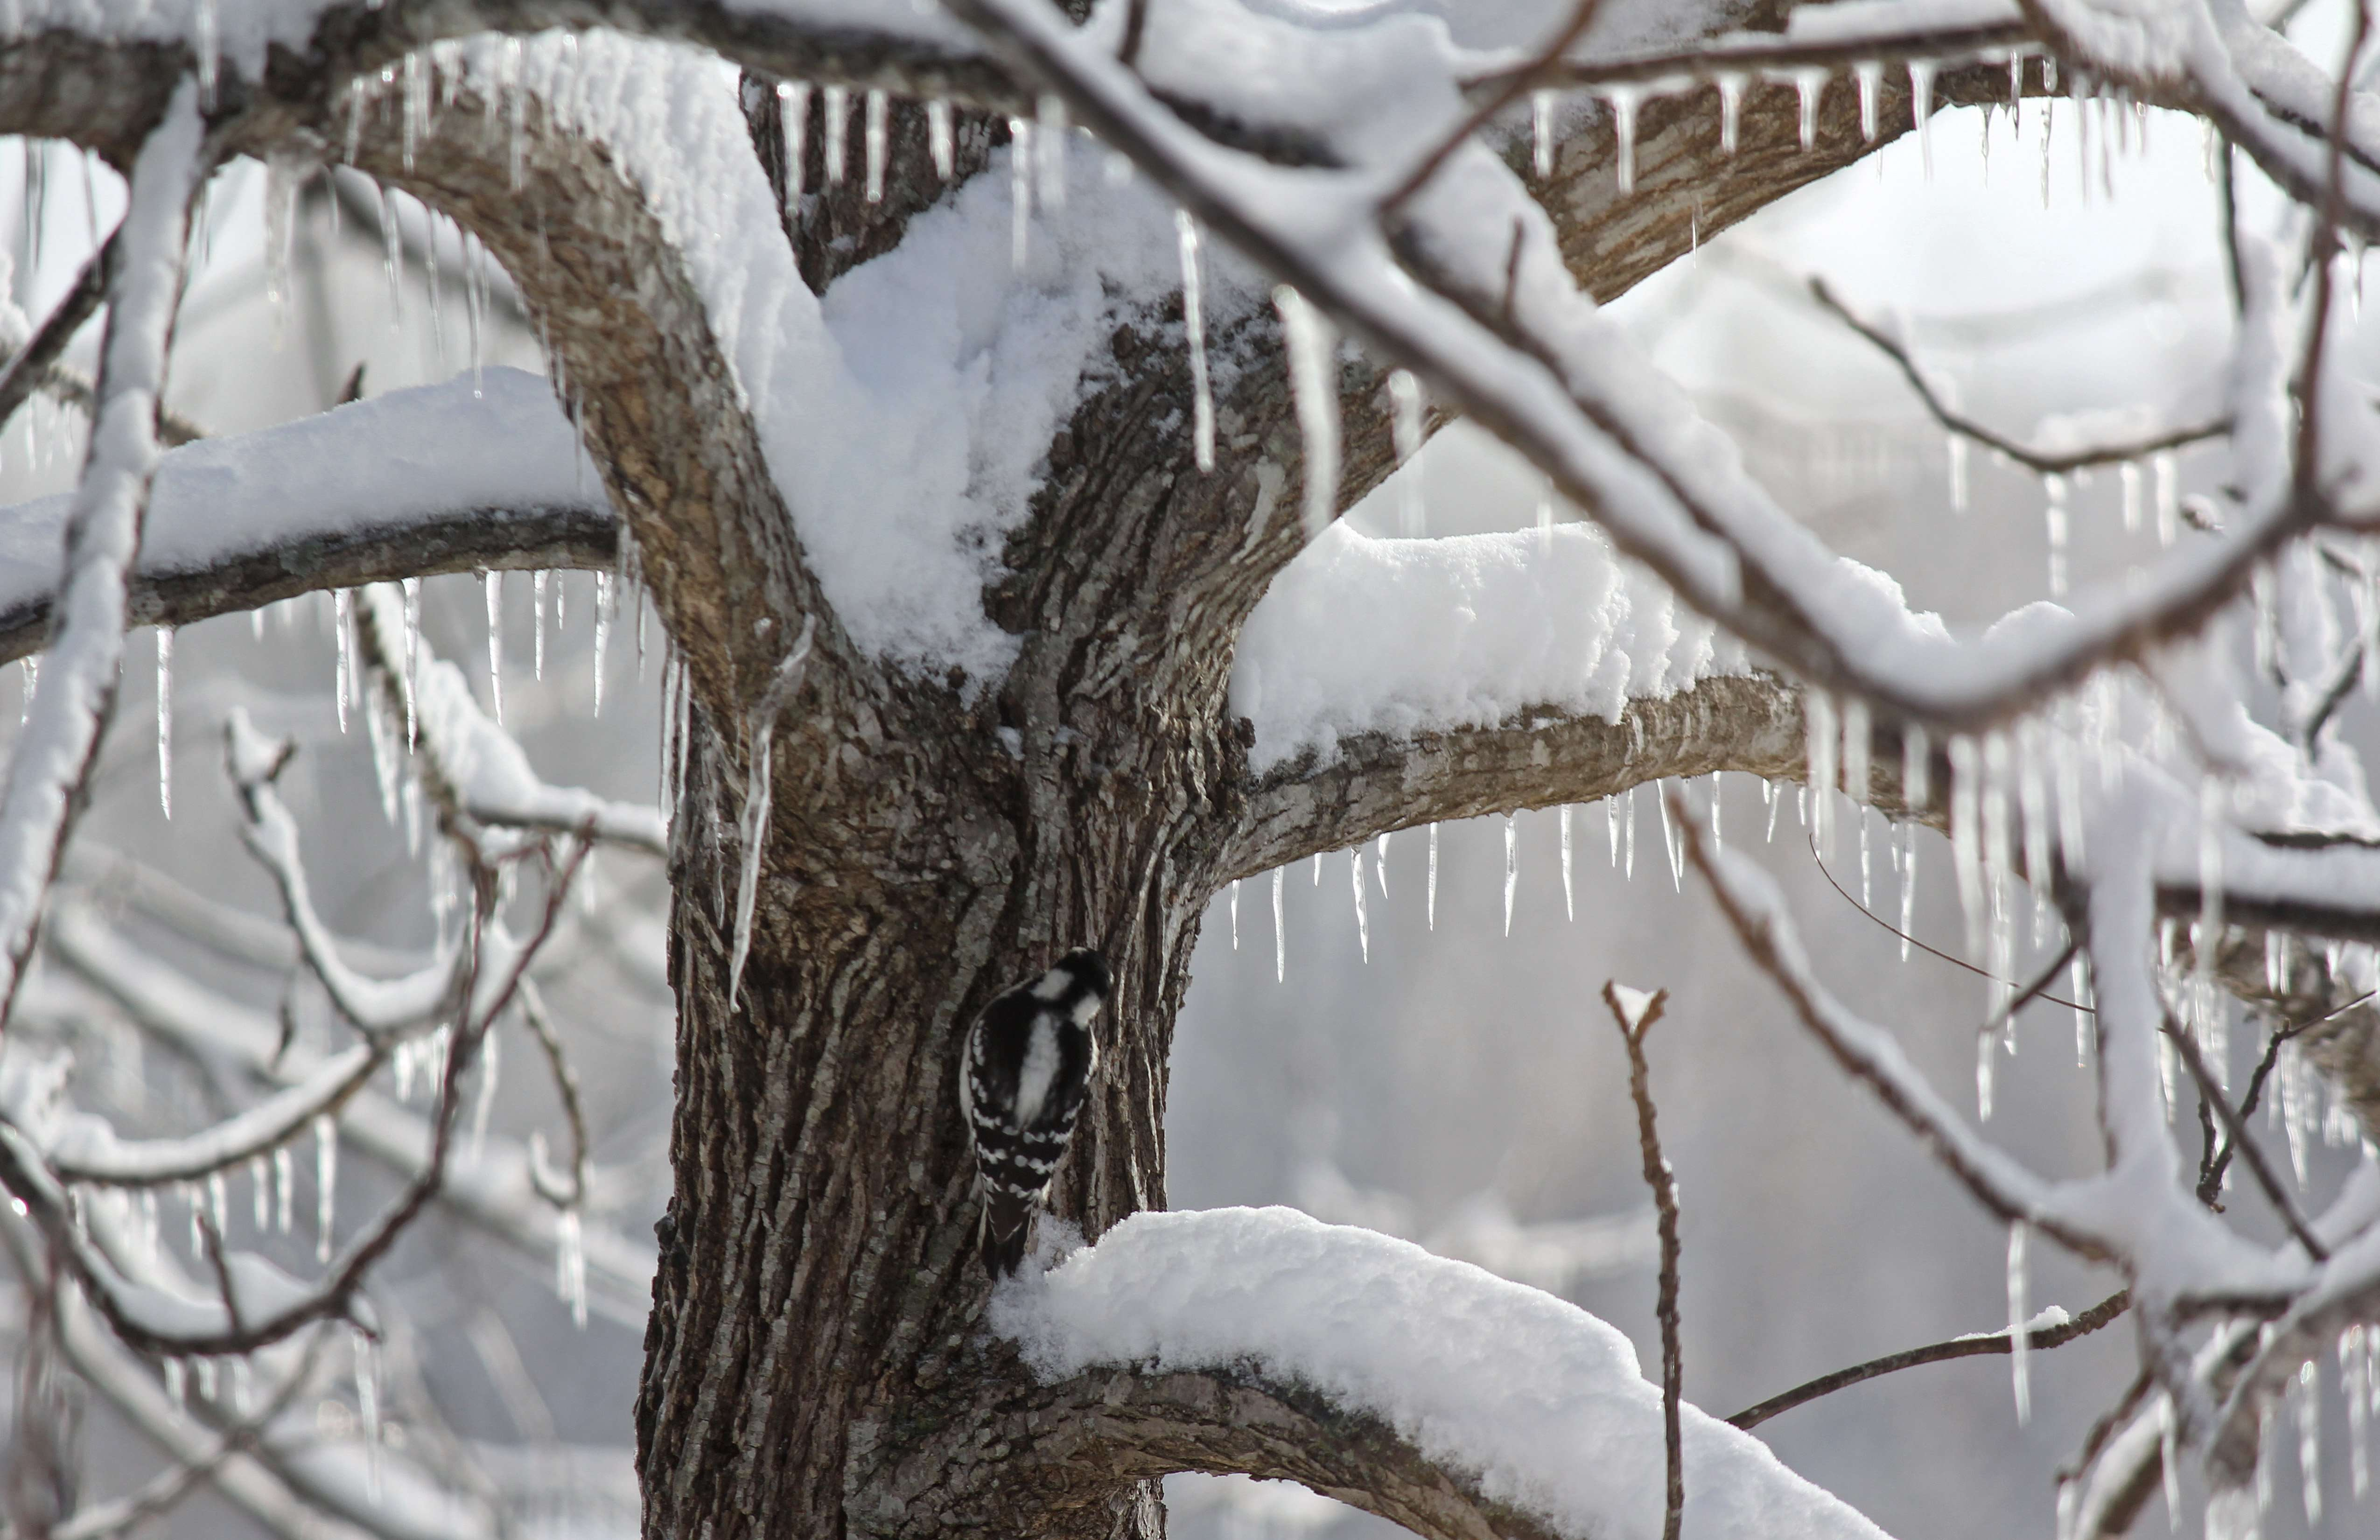 Wintertime Snow and Ice decorates Walnut Tree